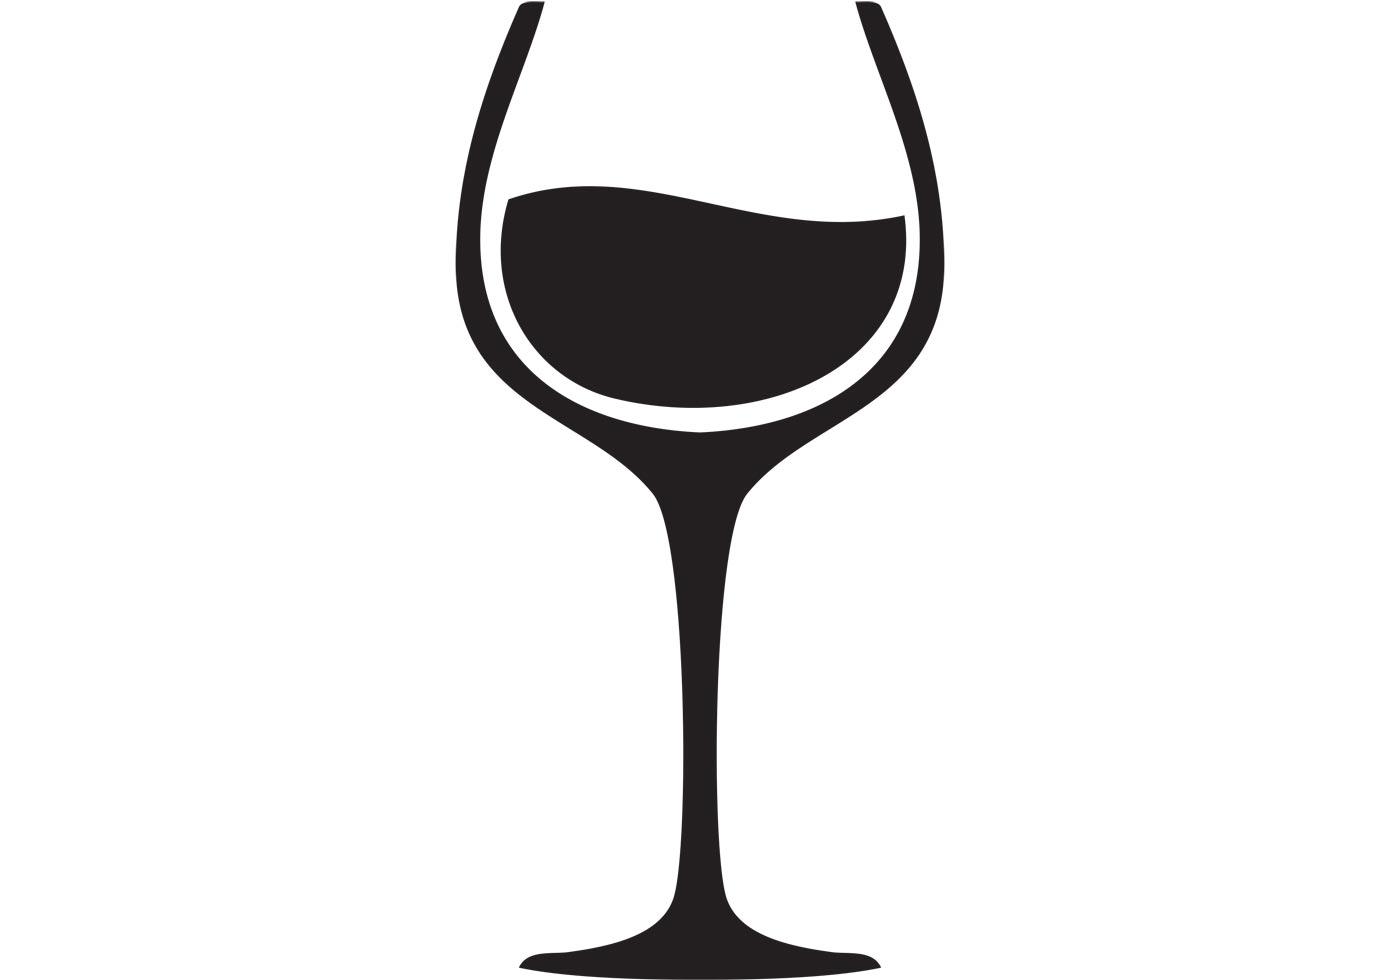 Free Wine Glass Silhouette Clip Art, Download Free Clip Art.